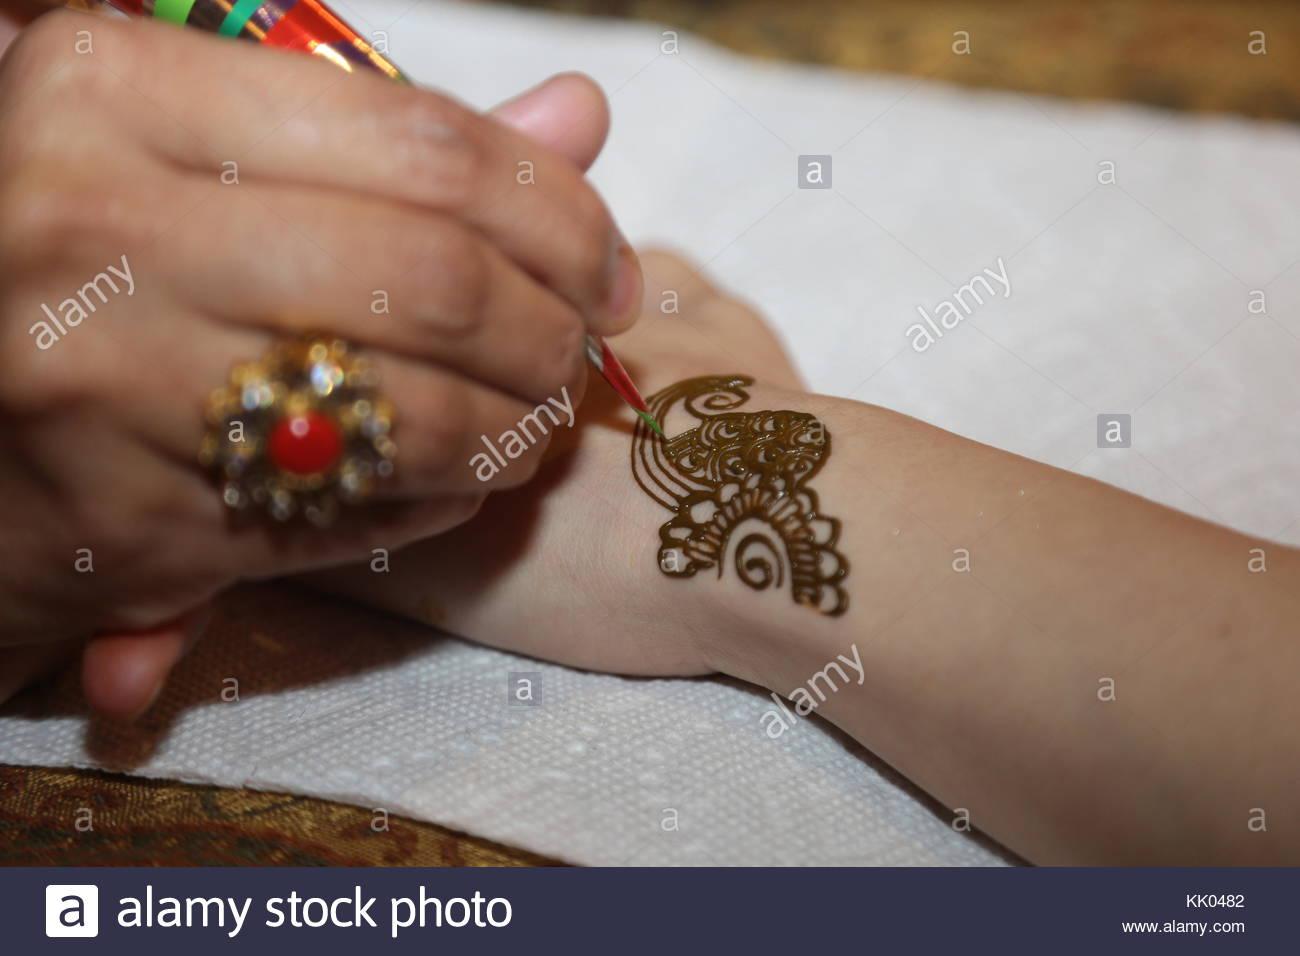 Mehndi Hand Patterns Diwali : Hand mehndi stock photos images alamy